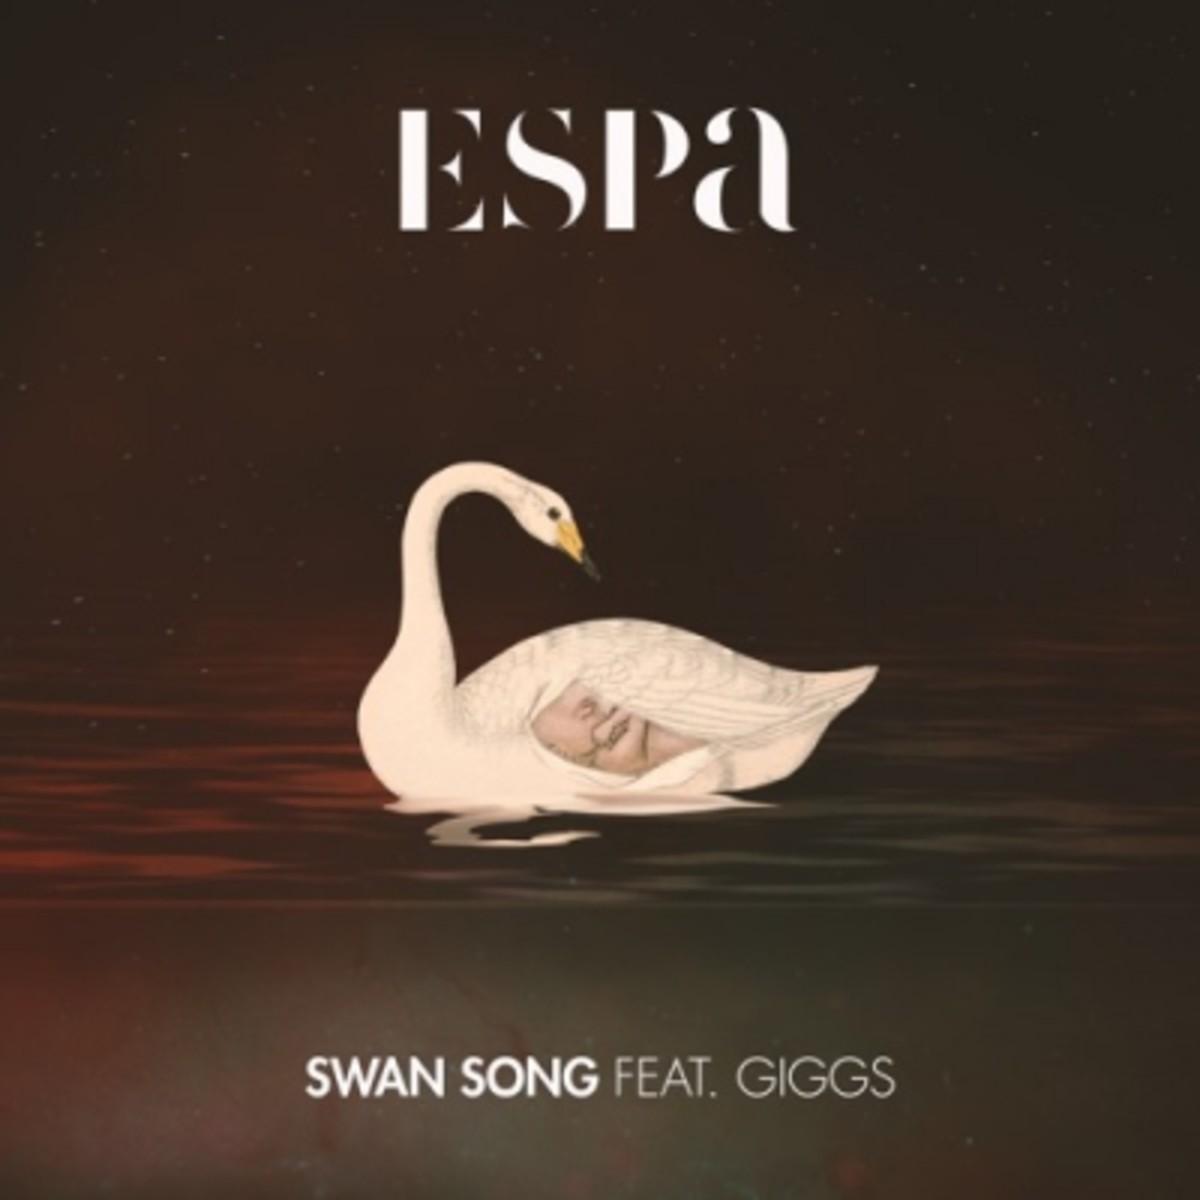 espa-swan-song.jpg